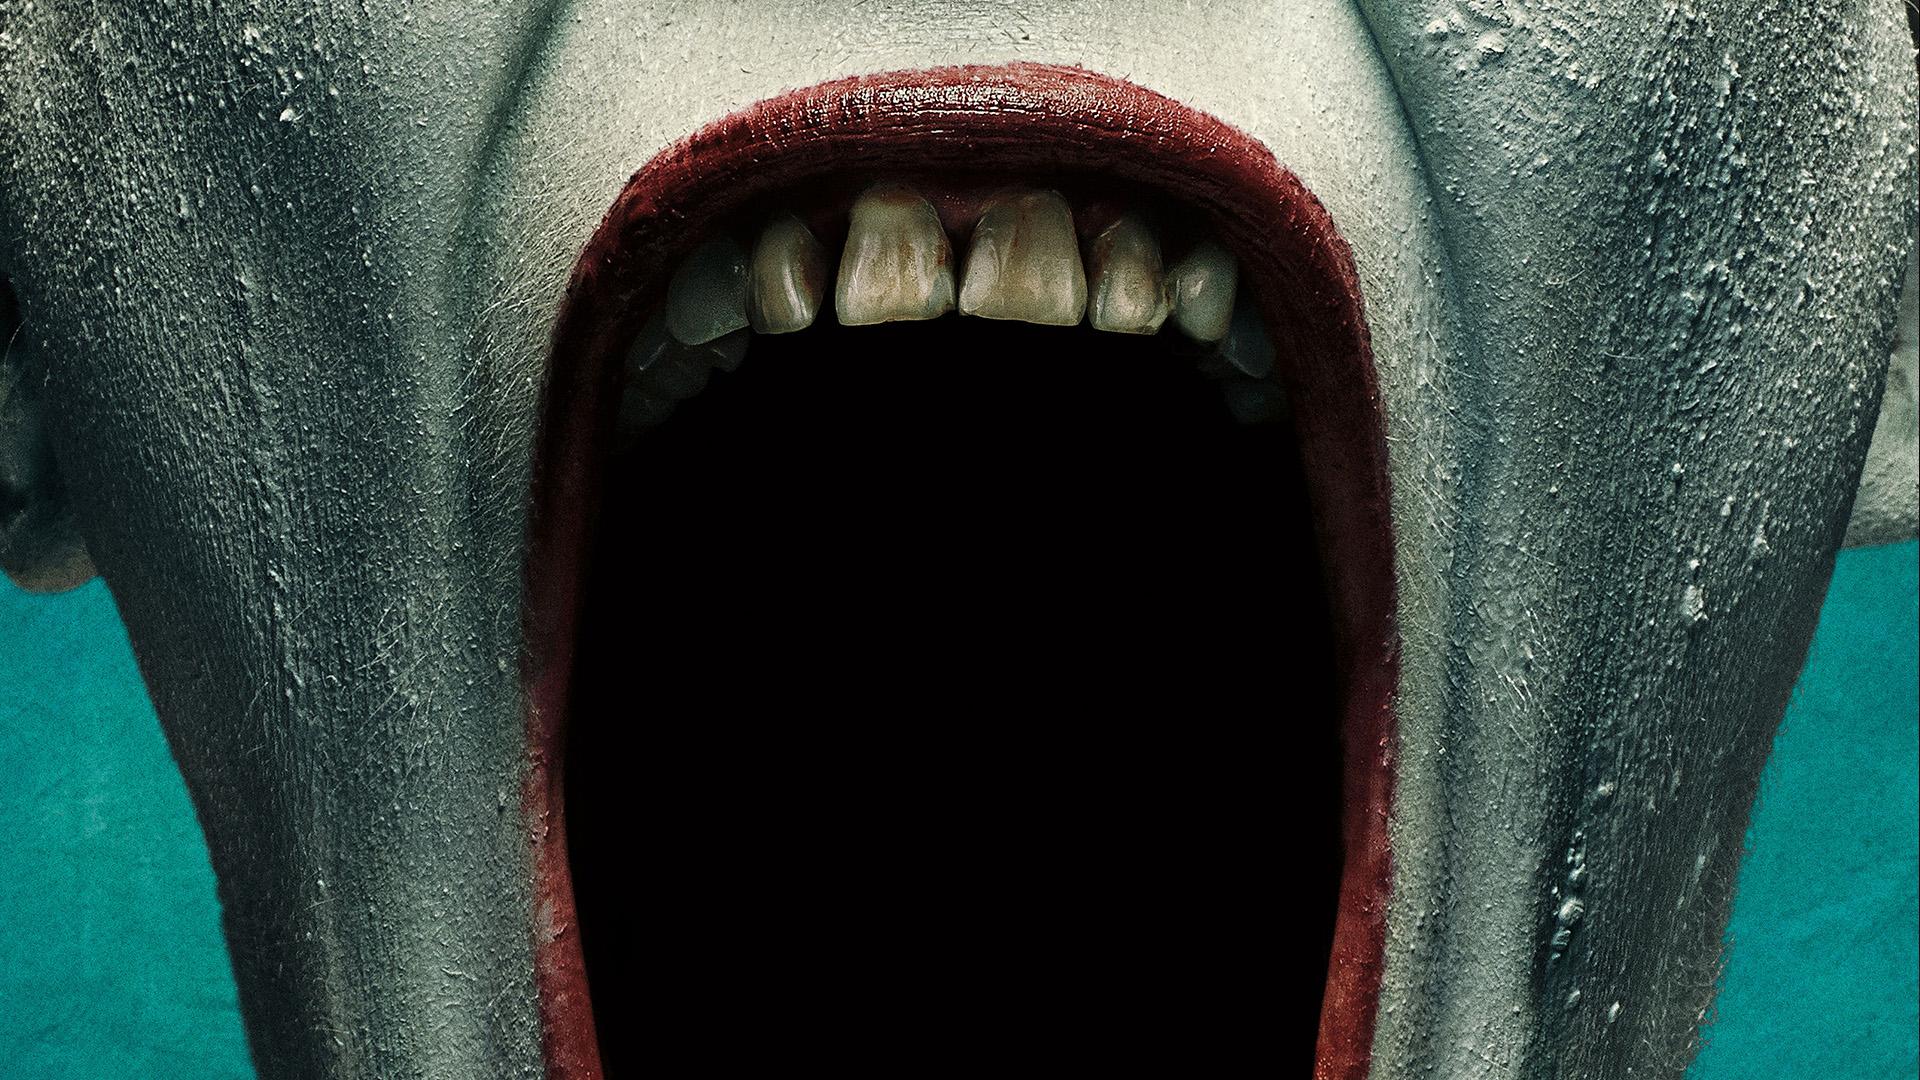 american horror story freak show iphone wallpaper